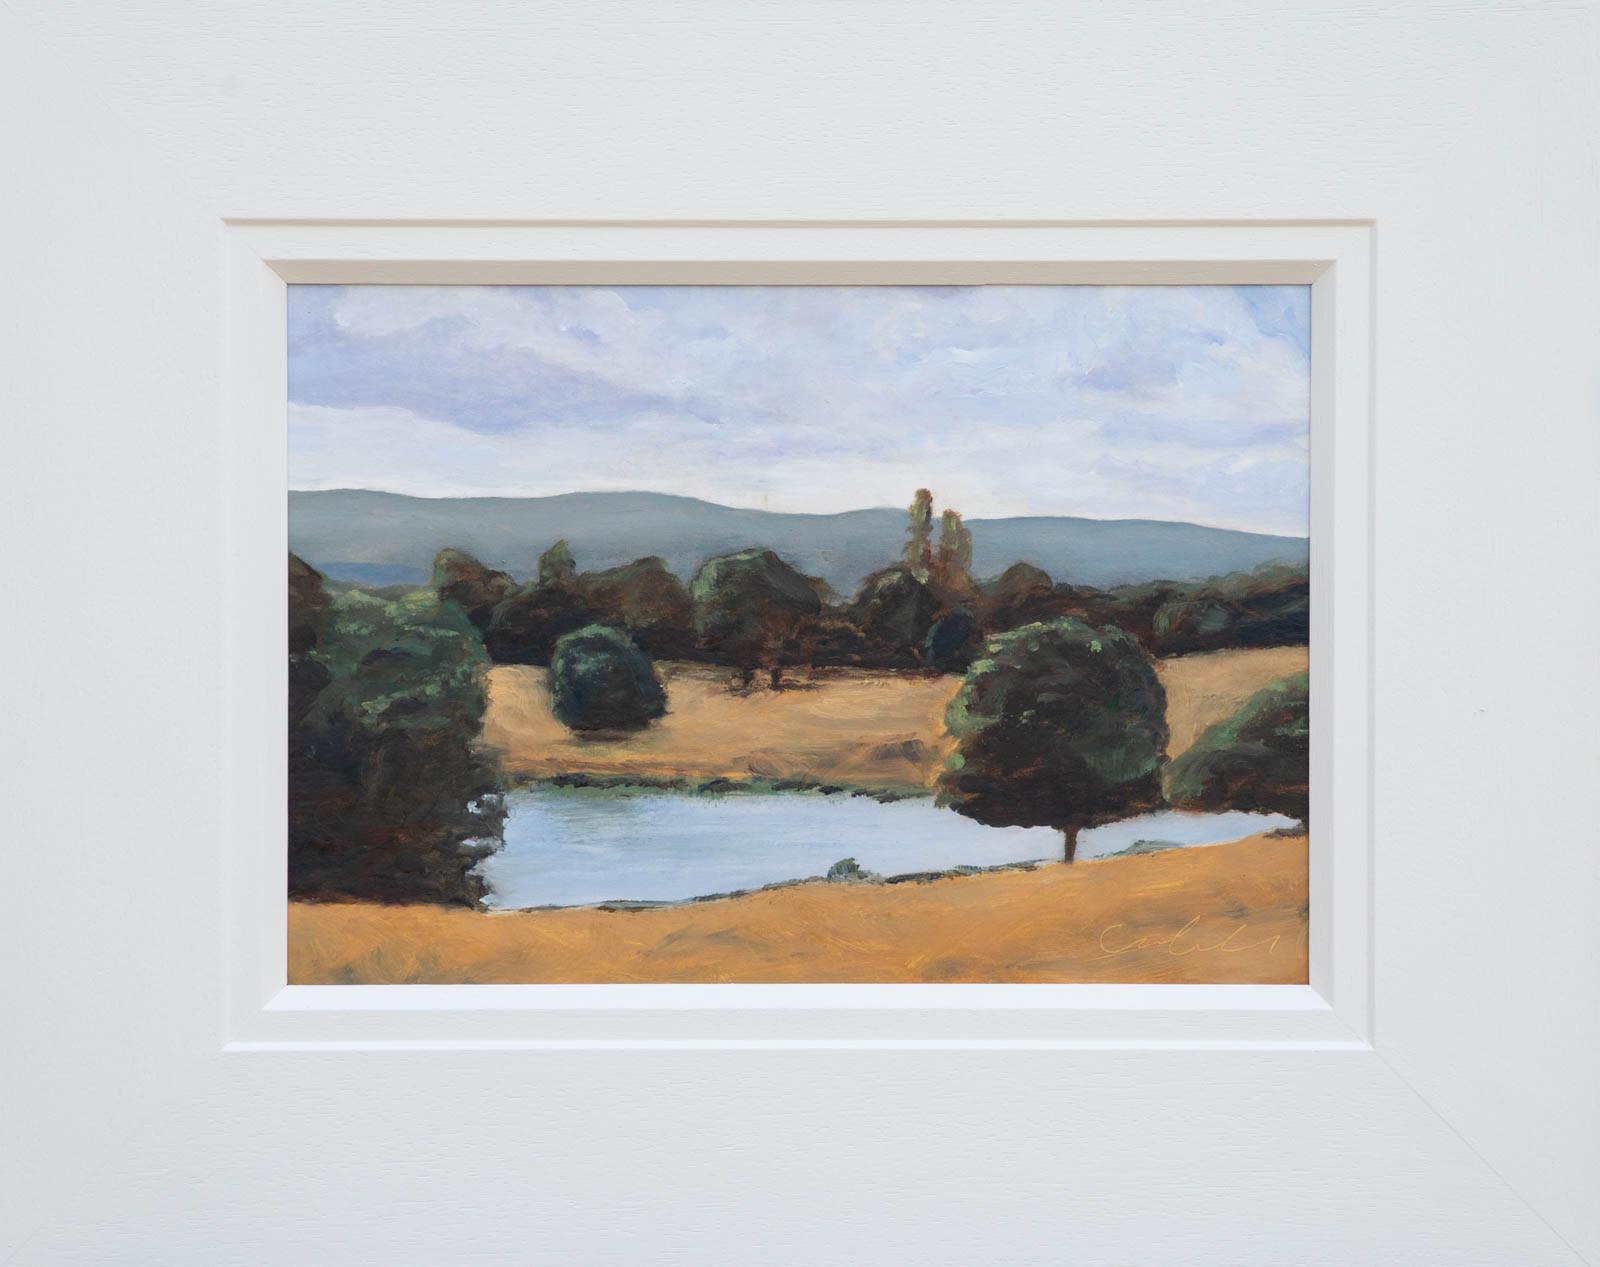 Petworth Park Memories, Matthew Cordwell